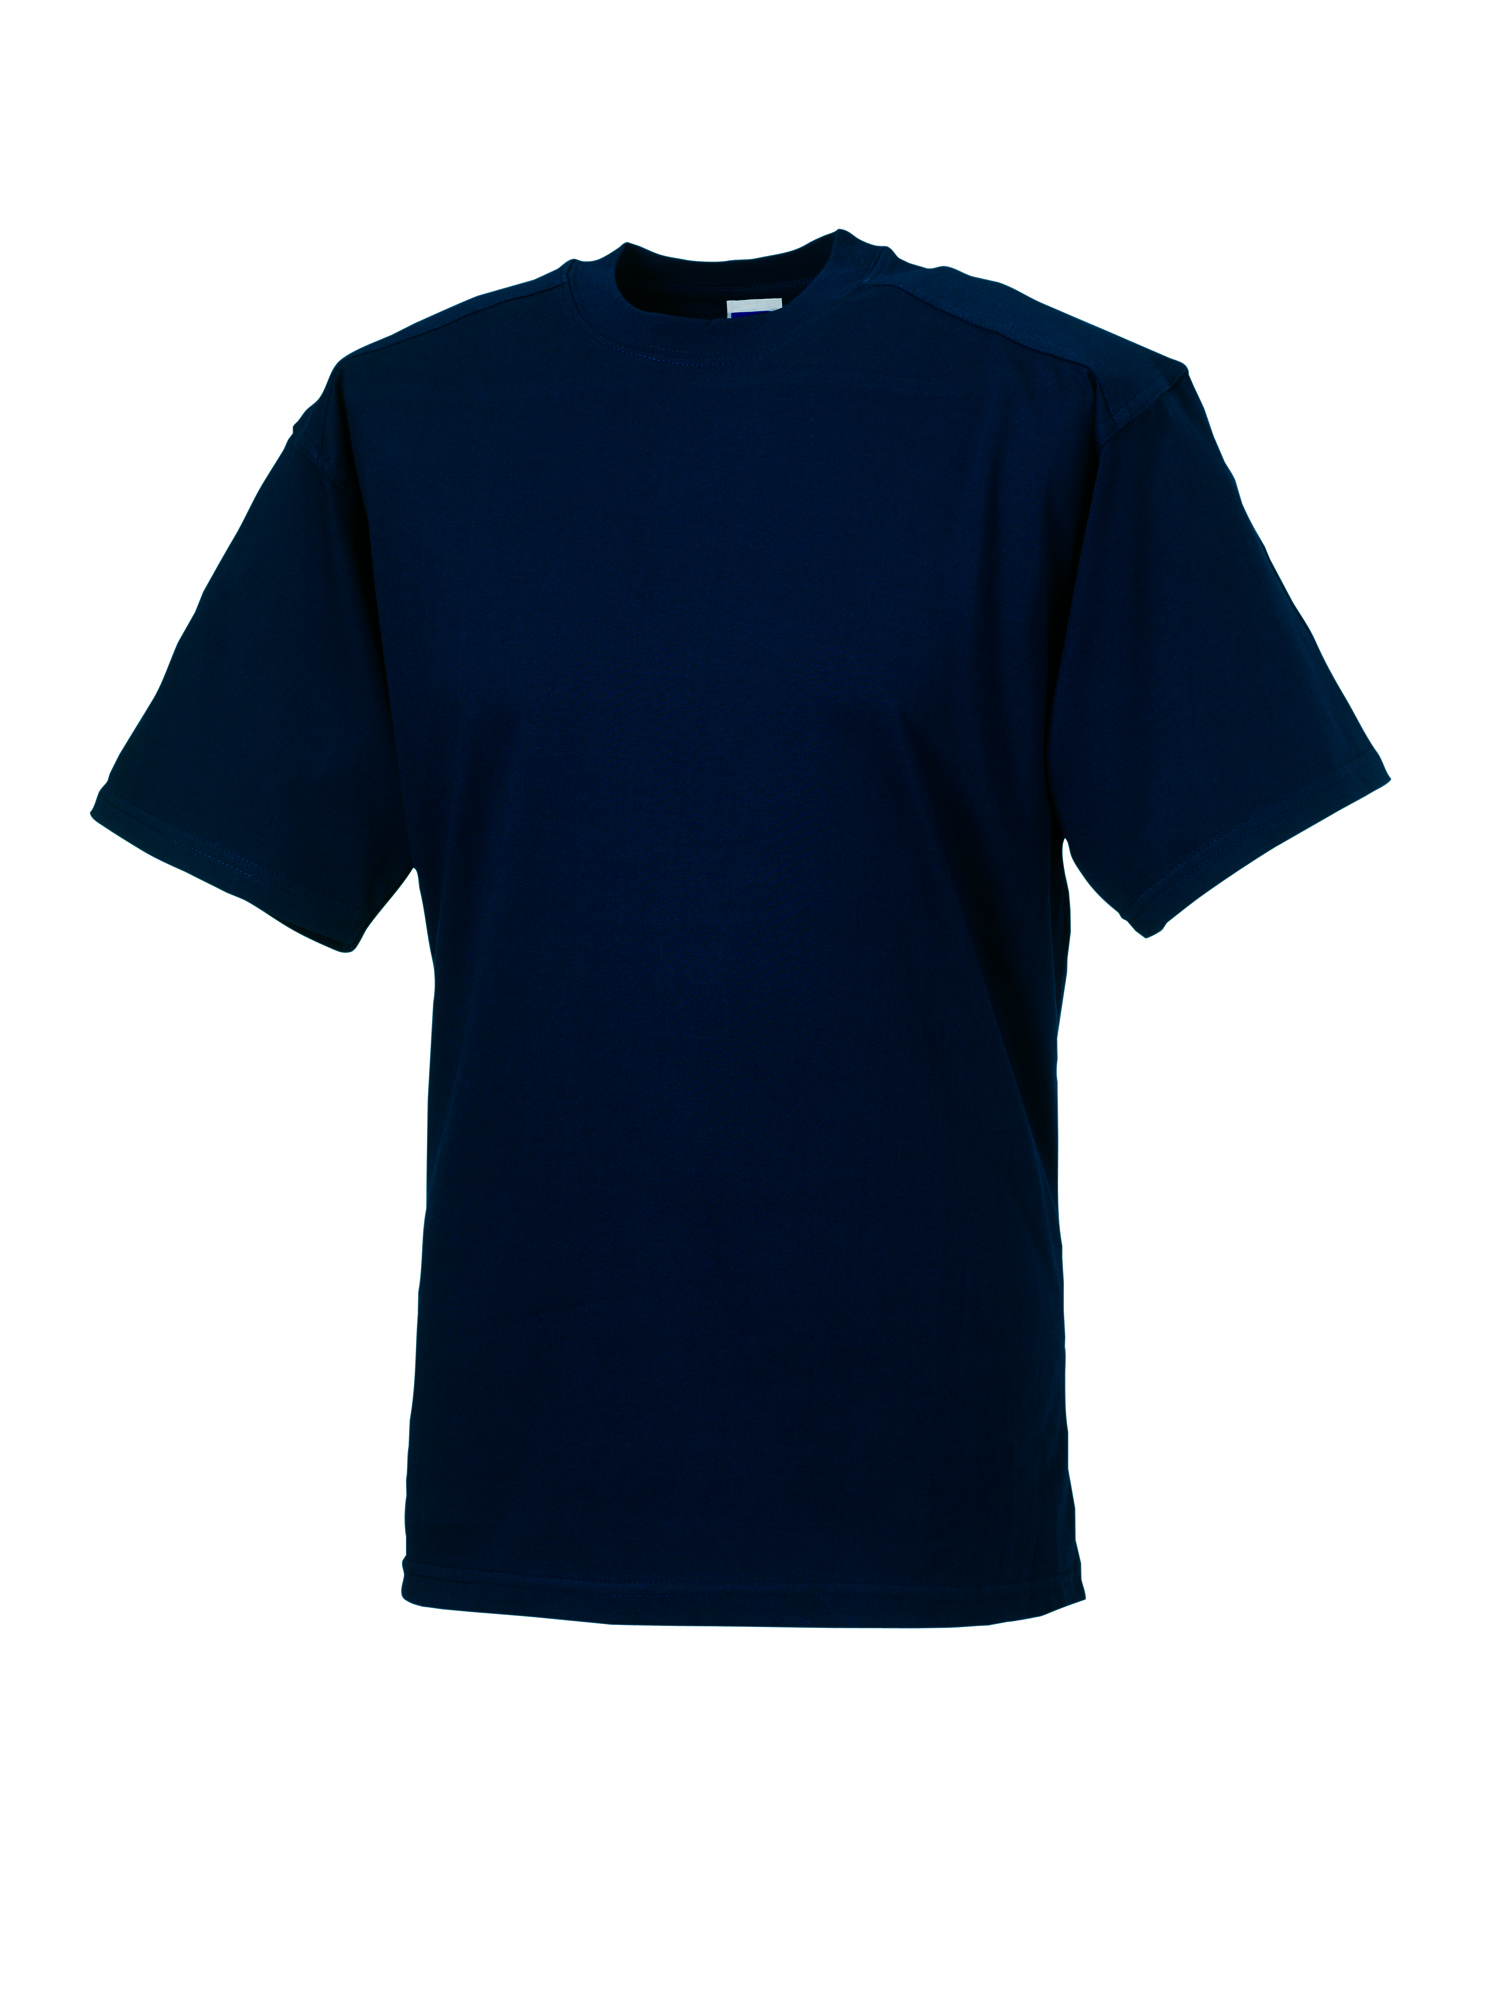 Heavy Duty T-Shirt - Light Oxford - XS